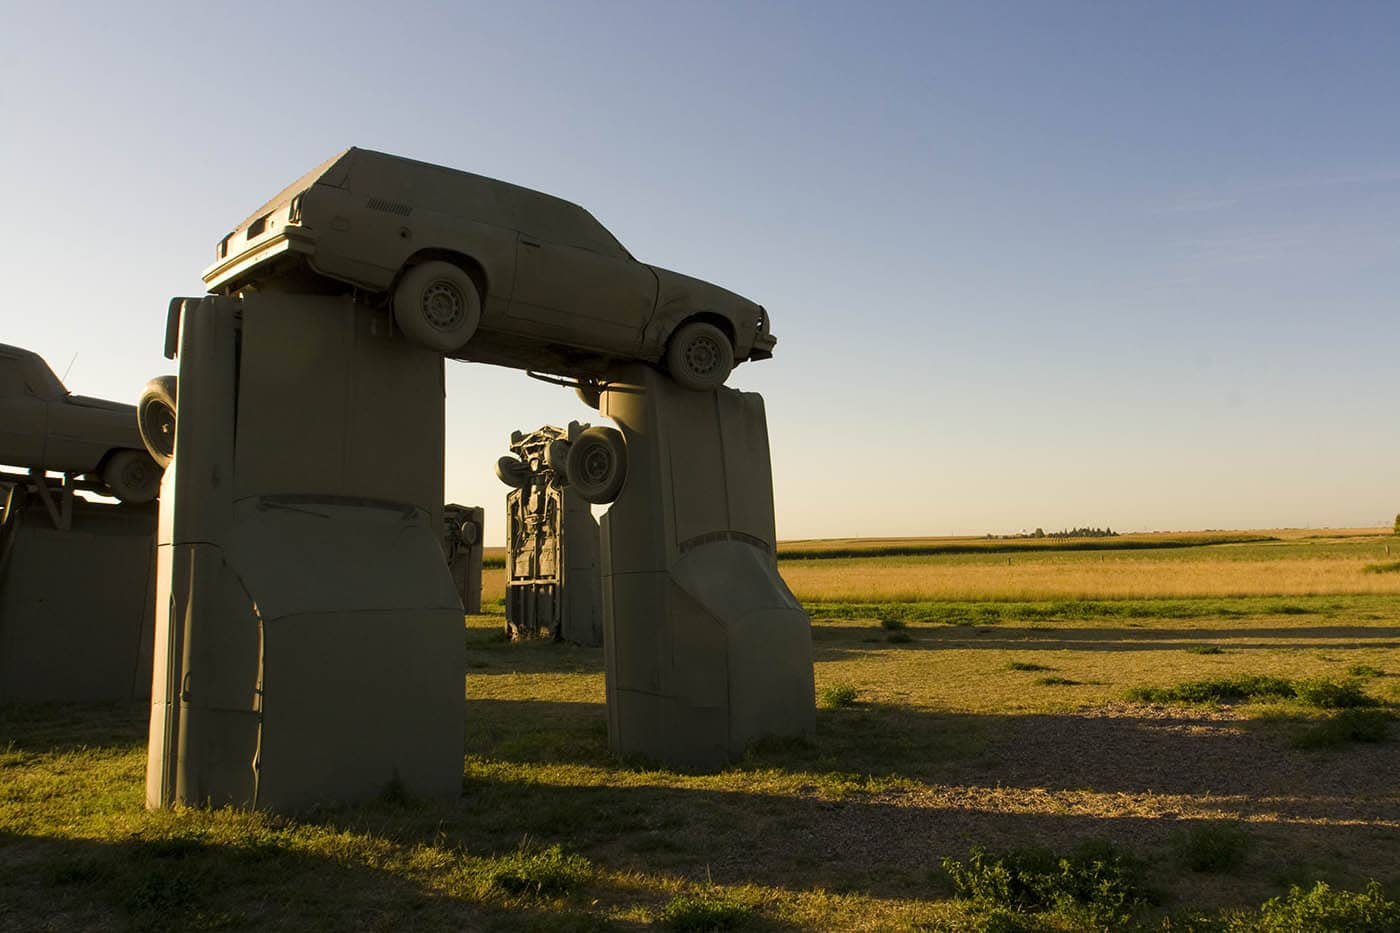 Carhenge roadside attraction in Alliance, Nebraska. Labor Day Chicago to Mount Rushmore Road Trip.